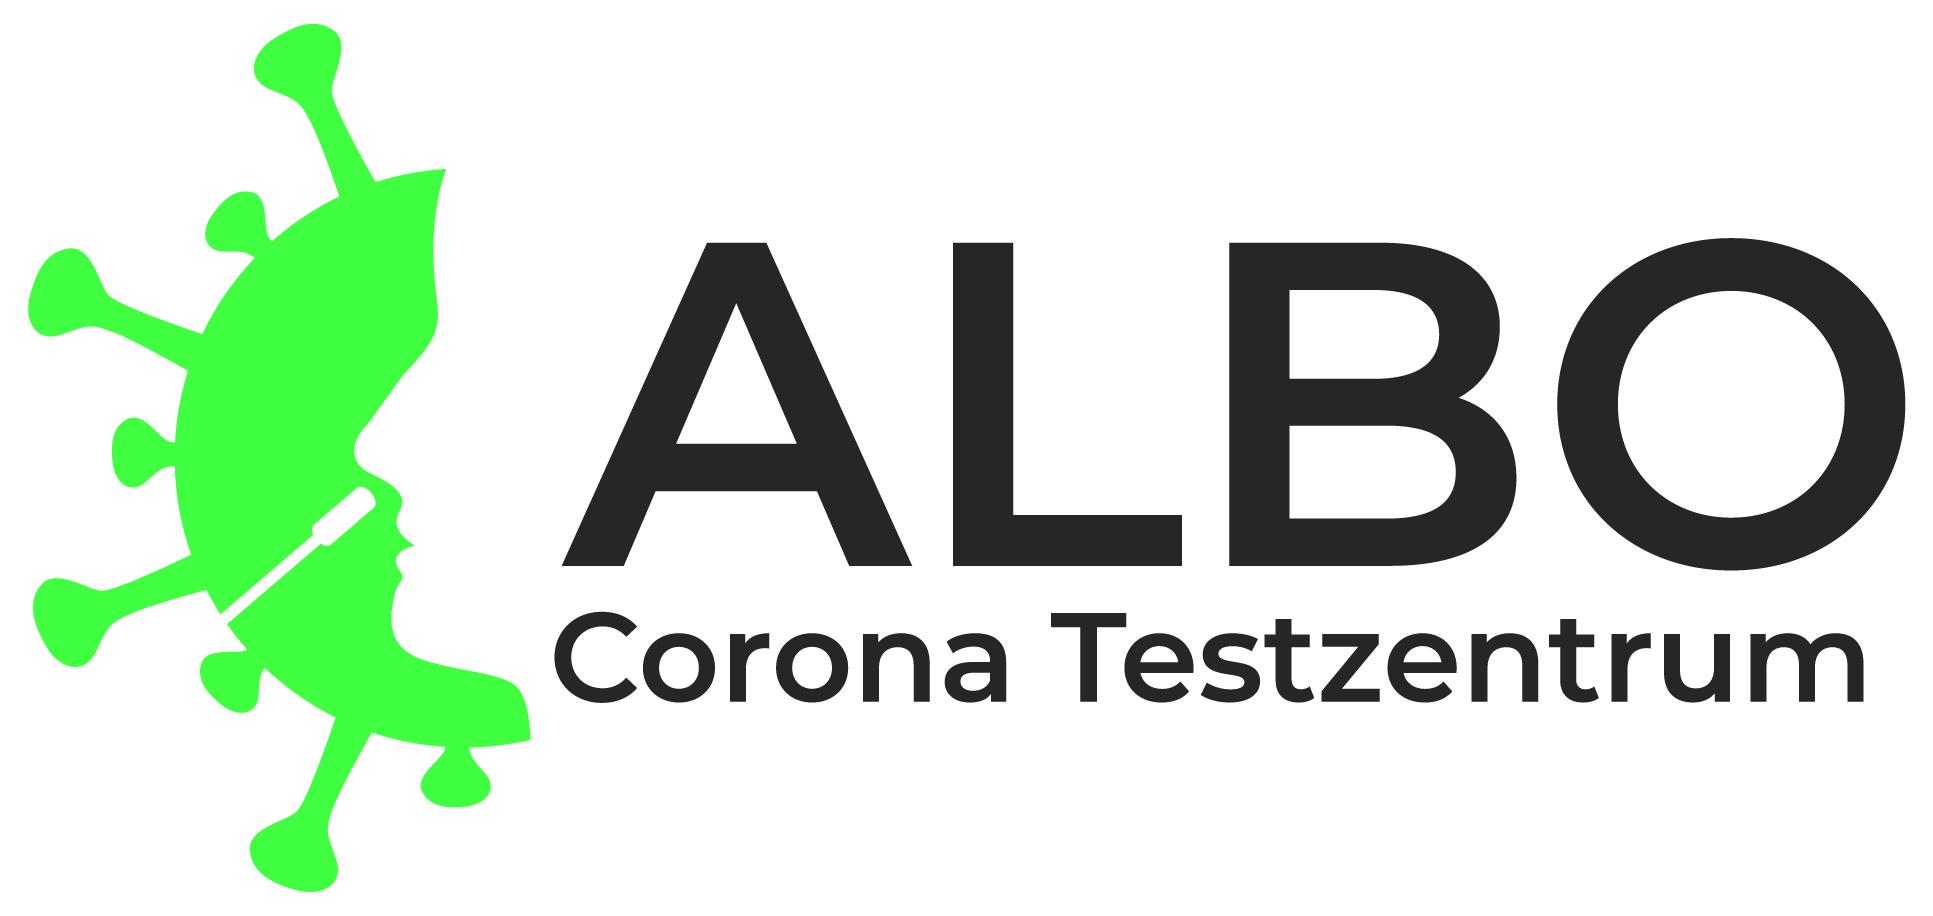 ALBO Corona Testzentrum LM6447 17082021